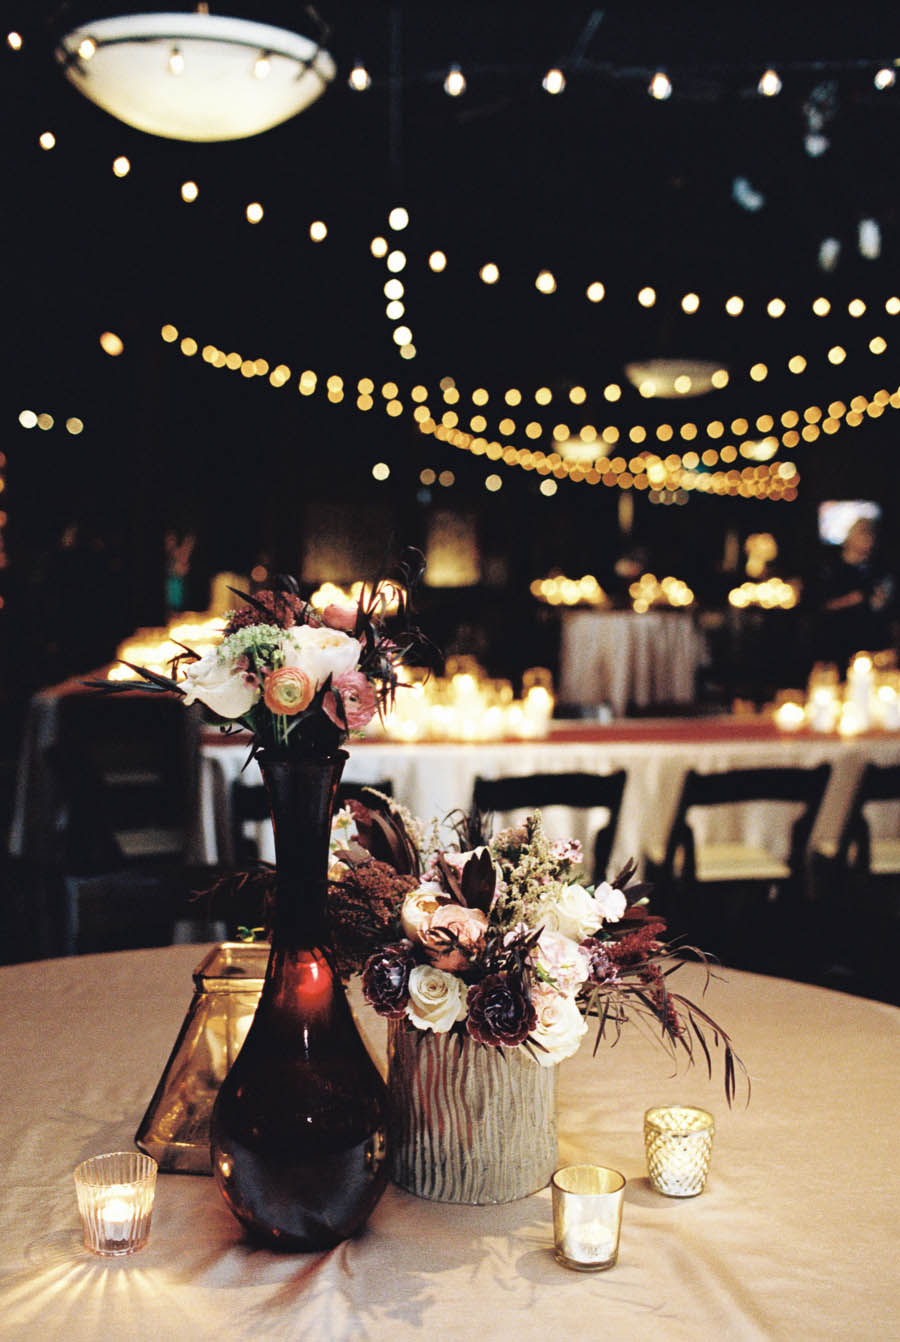 musicians hall of fame wedding photographers film documentary ©2016abigailbobophotography-33.jpg